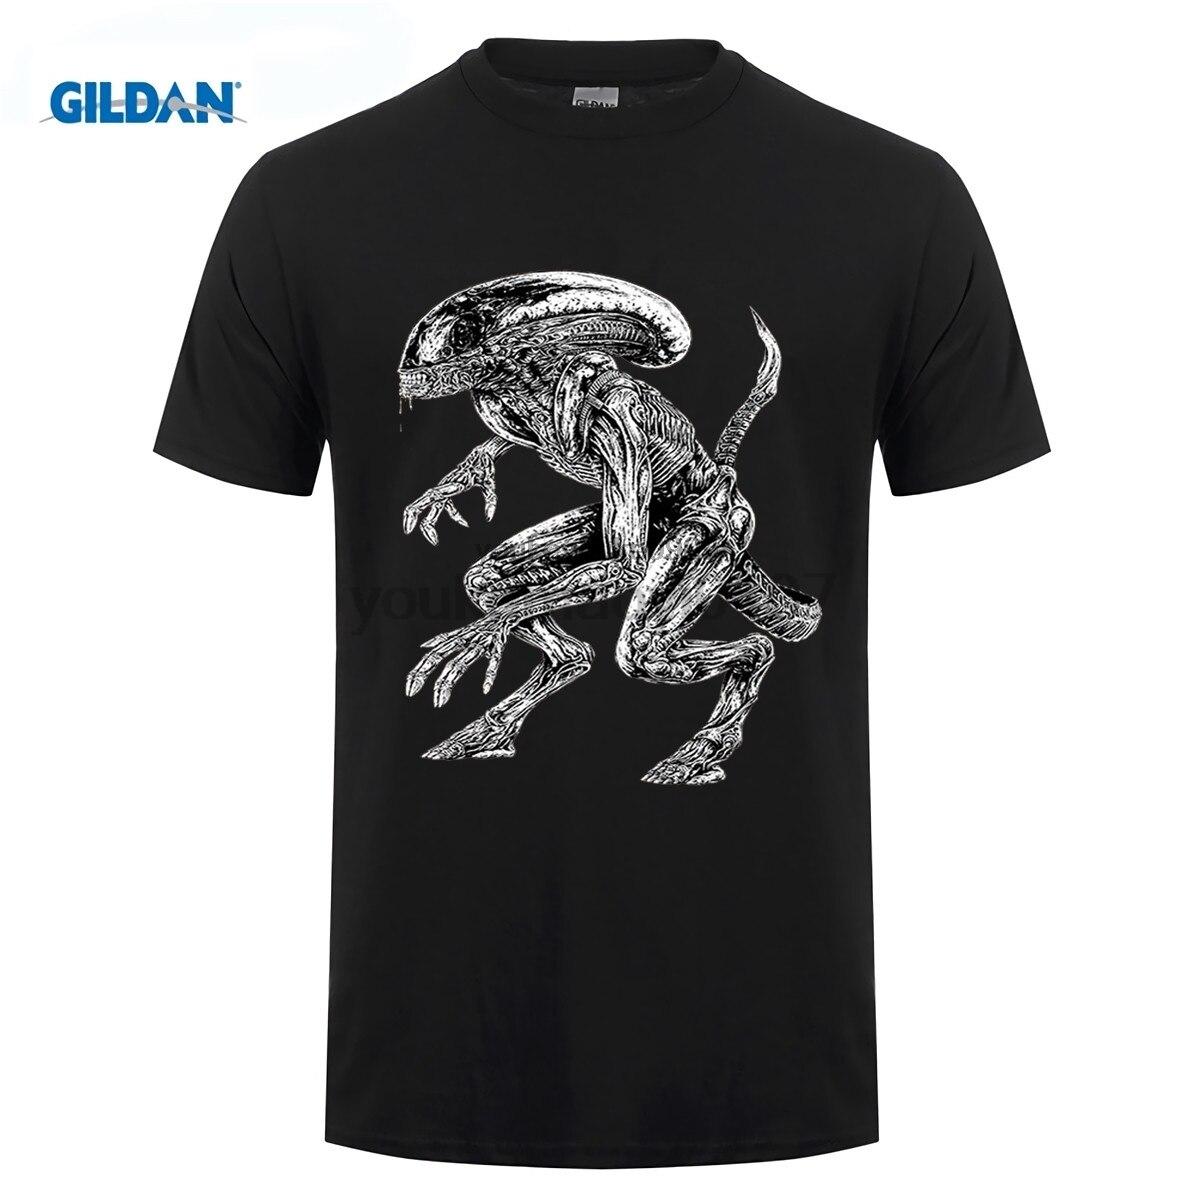 GILDAN designer t shirt AVP ALIEN VS predator T shirt Top Lycra Cotton Men T shirt New Design High Quality in T Shirts from Men 39 s Clothing